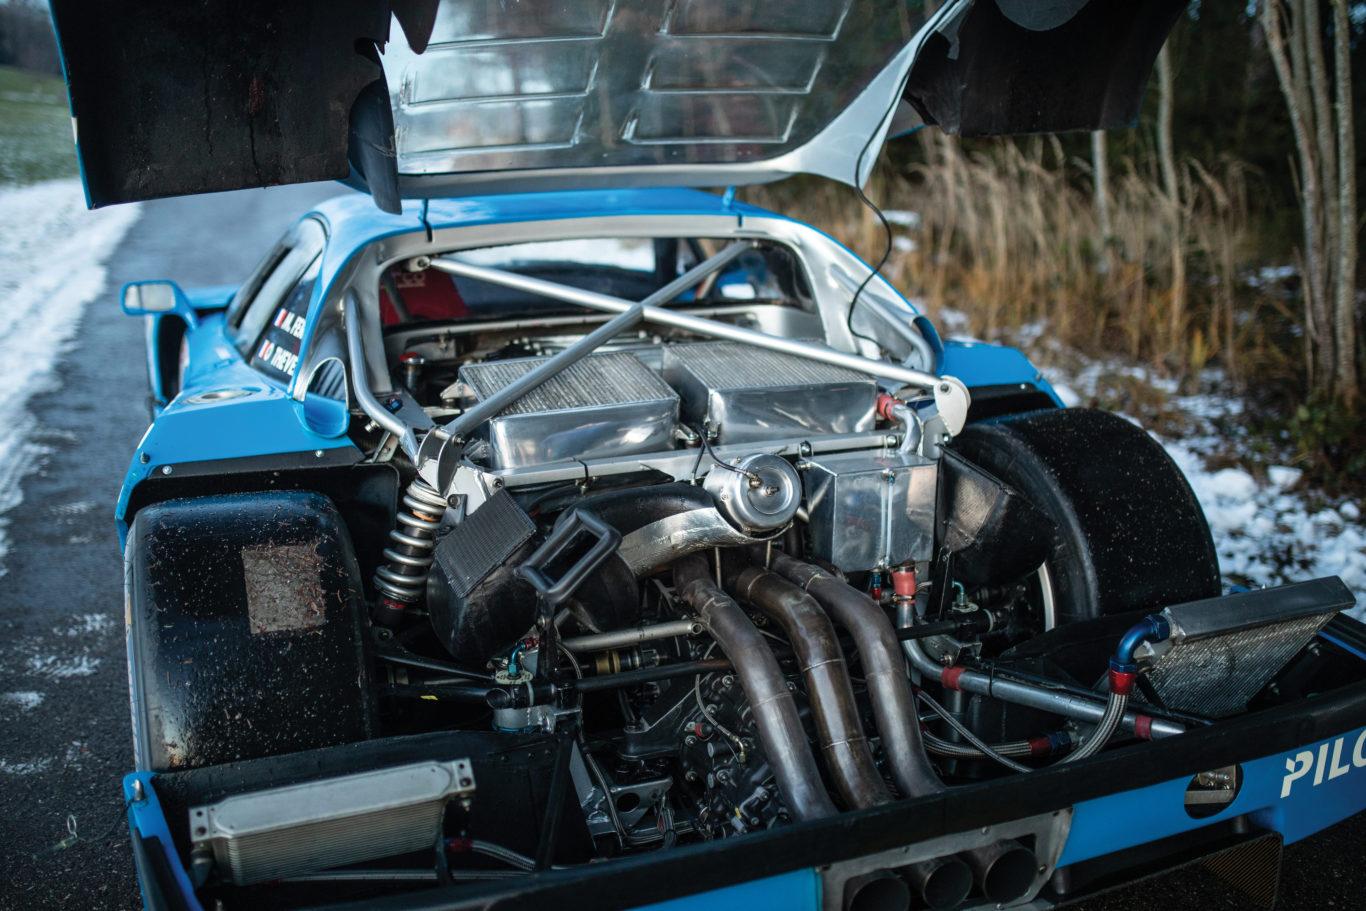 Ferrari F40 LM sells for £4.2 million